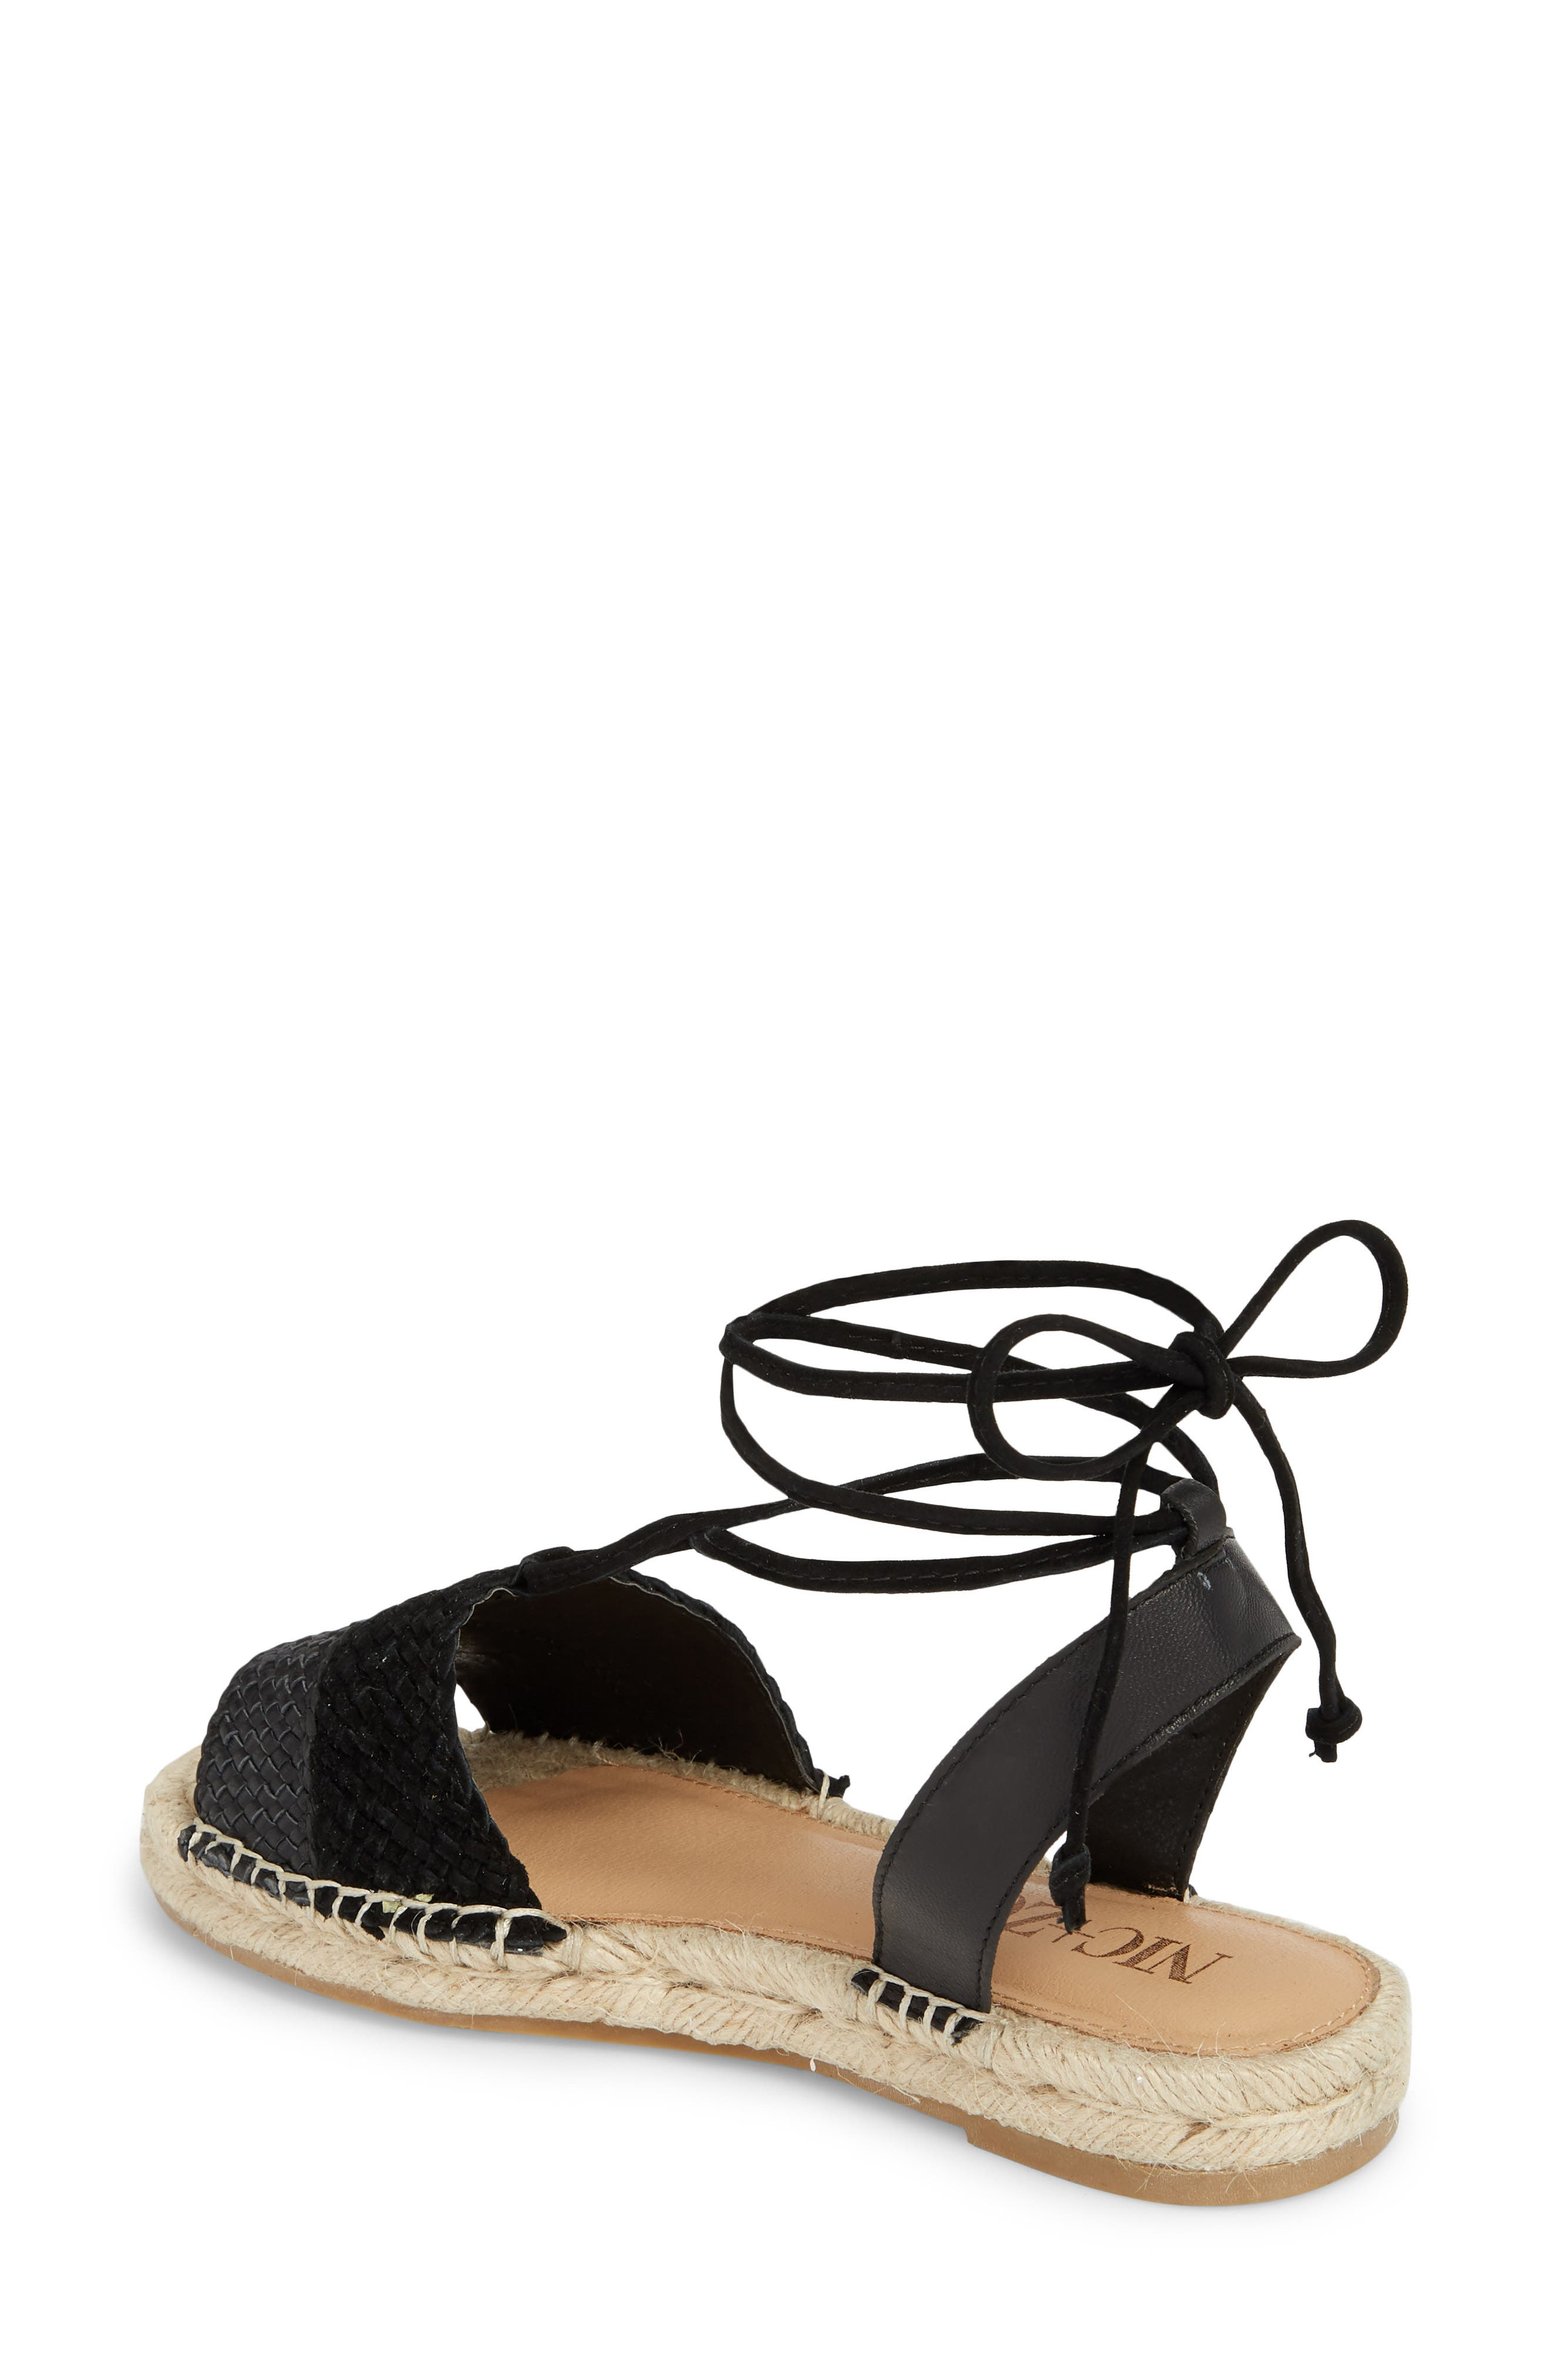 Eliza Ankle Wrap Espadrille Sandal,                             Alternate thumbnail 2, color,                             BLACK FABRIC